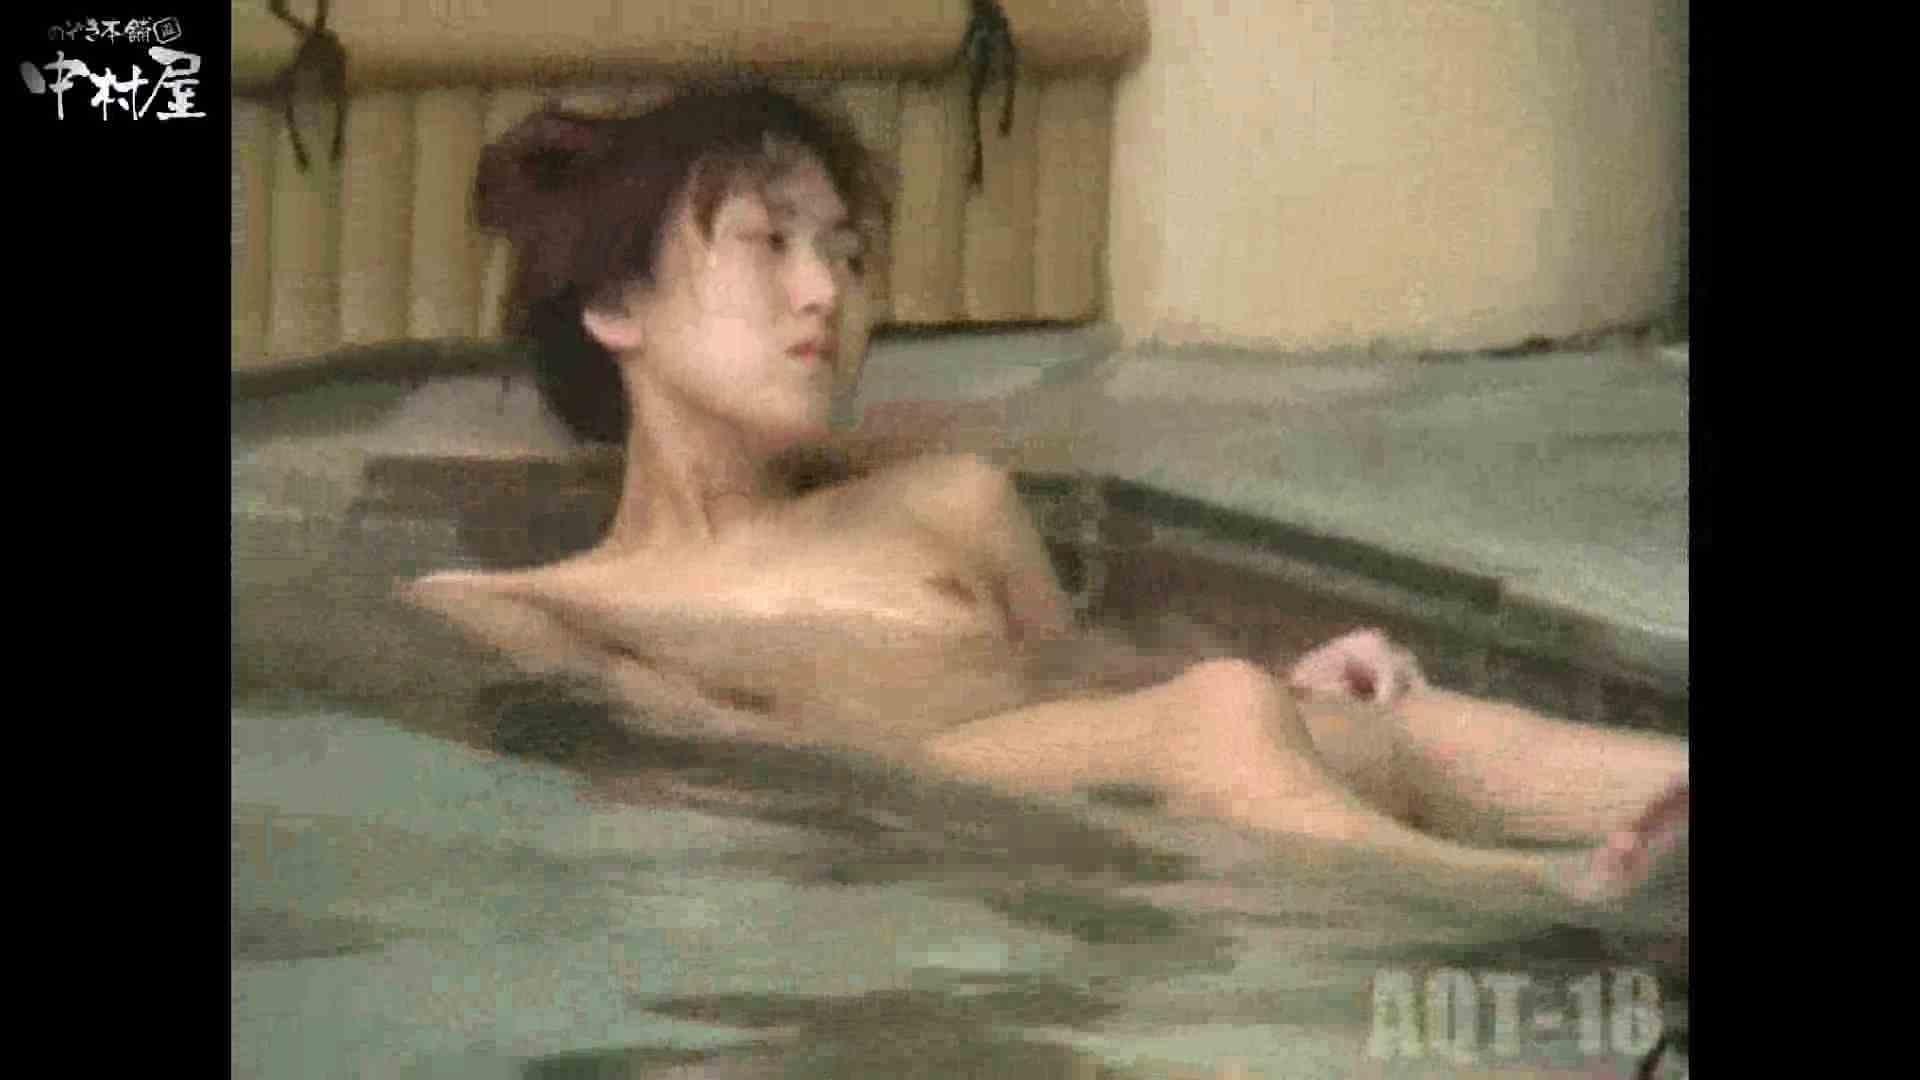 Aquaな露天風呂Vol.882潜入盗撮露天風呂十八判湯 其の七 盗撮 AV動画キャプチャ 84画像 54